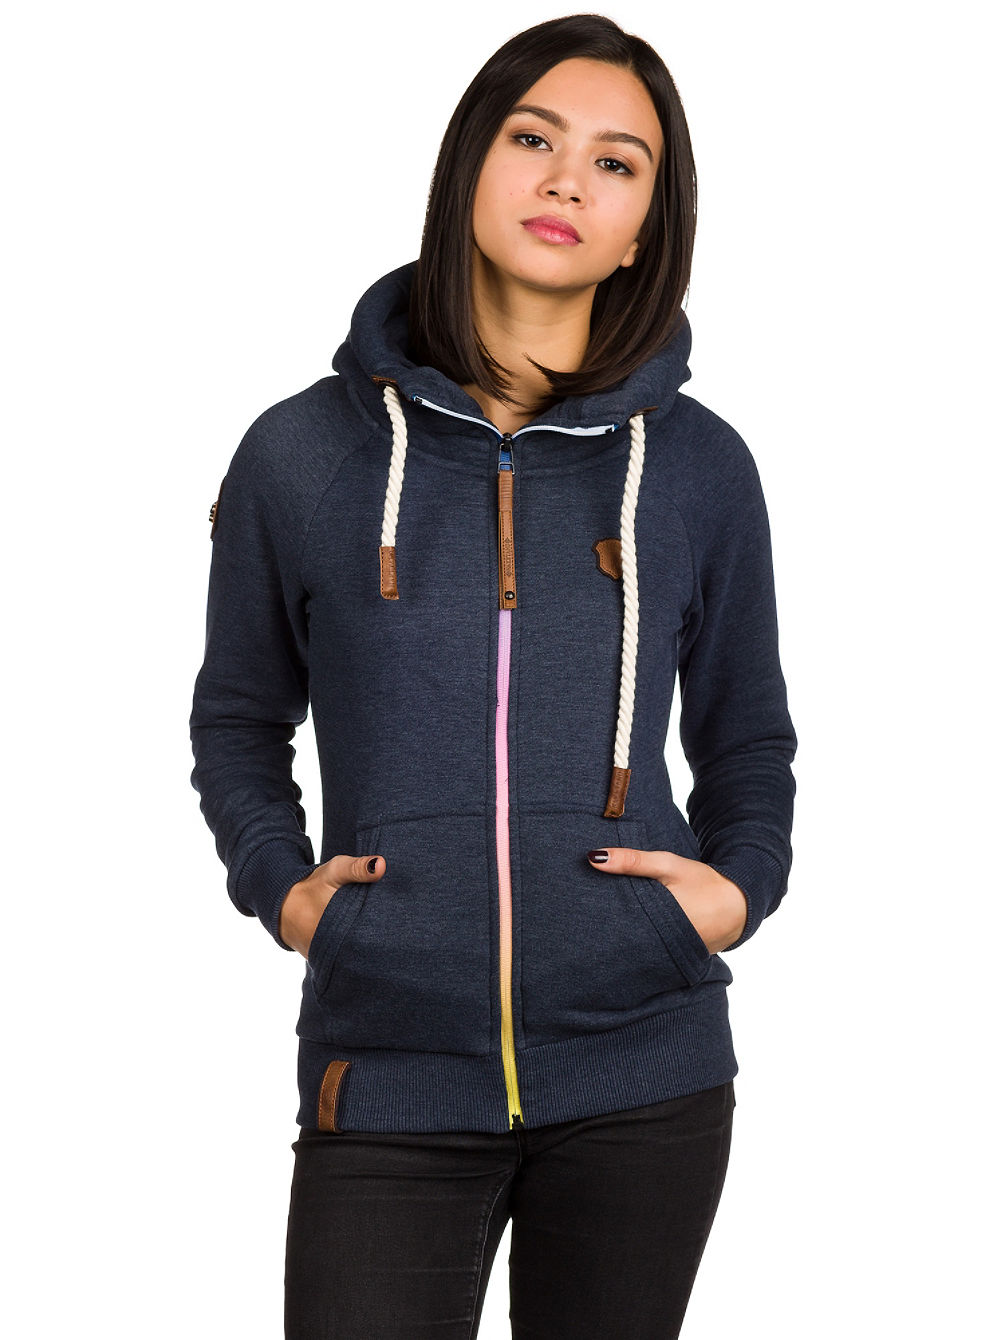 buy naketano der letzte seiner art zip hoodie online at. Black Bedroom Furniture Sets. Home Design Ideas